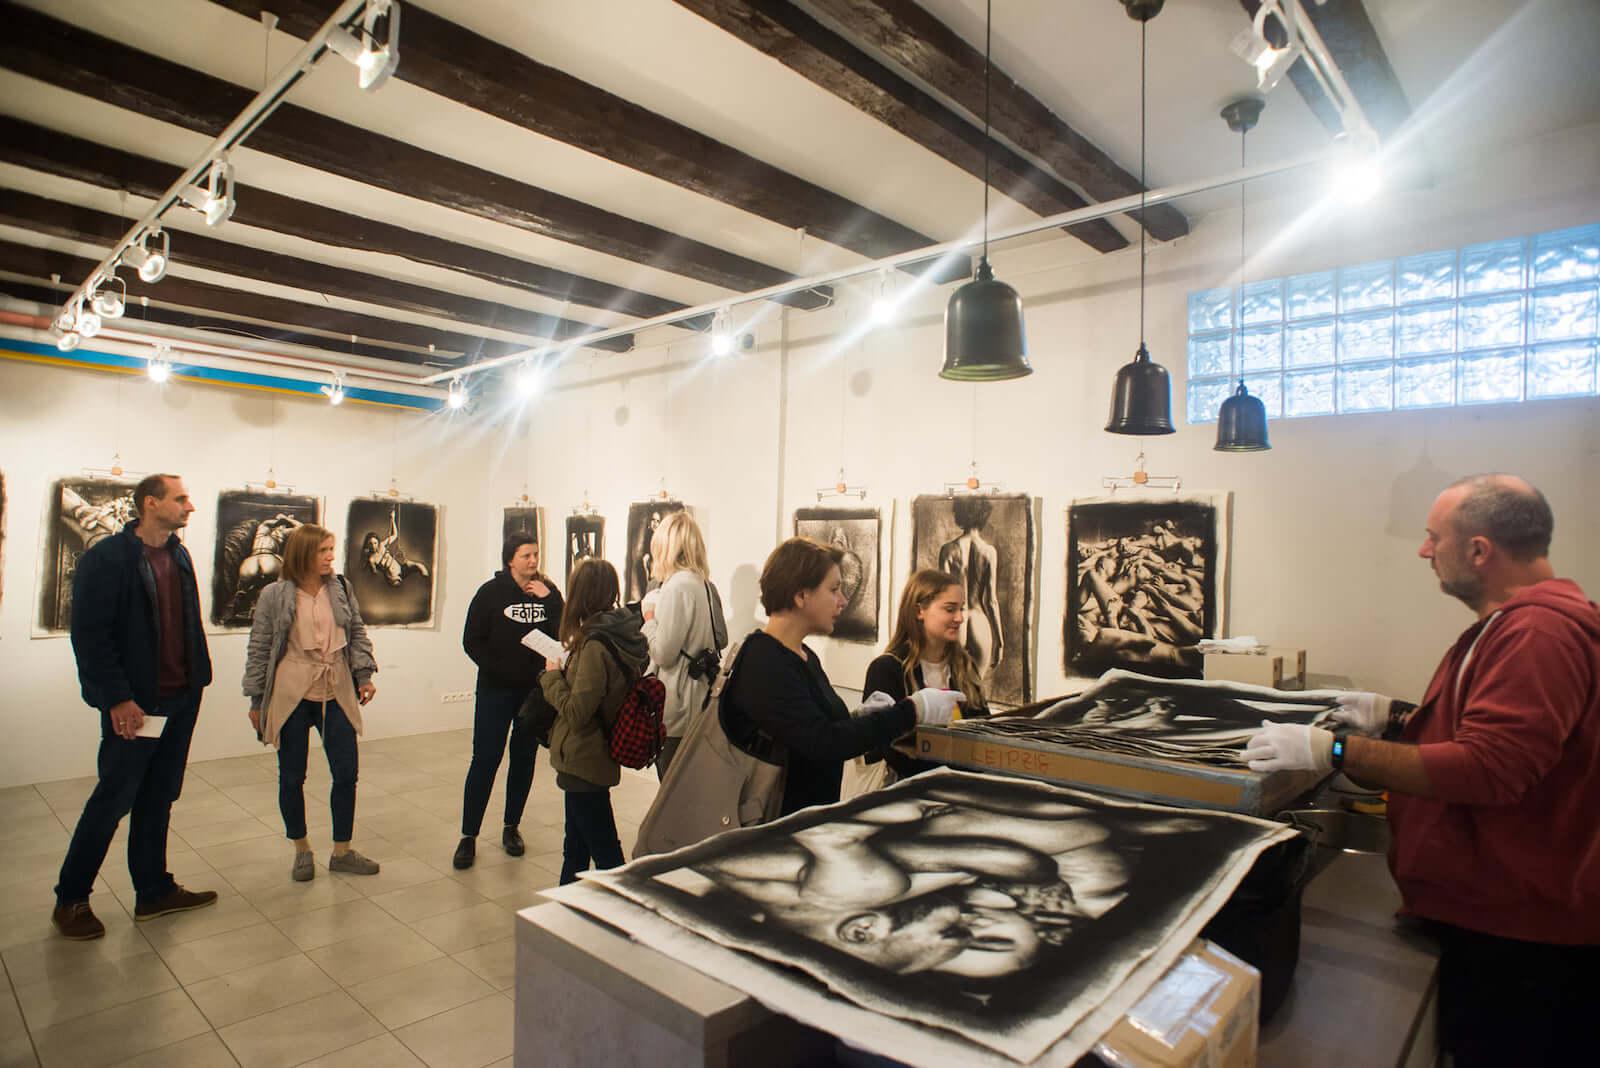 Wernisaż wystawy Laurent Benaim